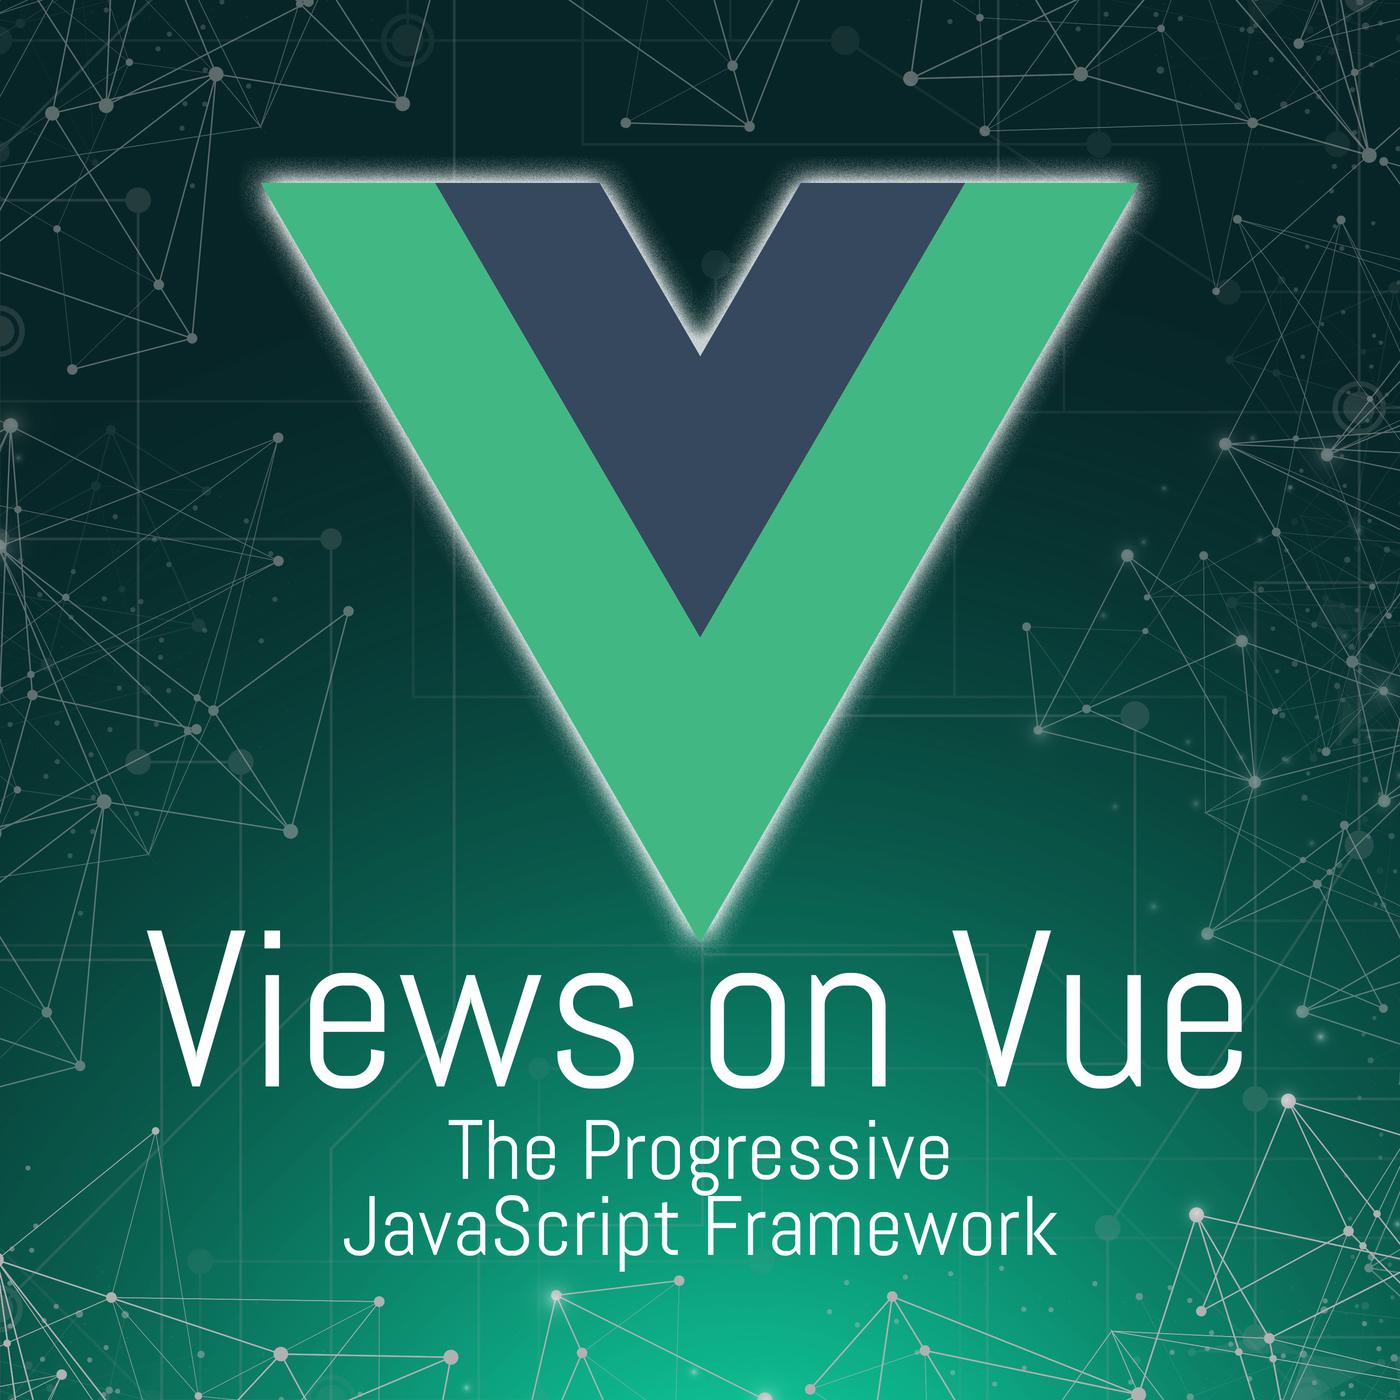 Views on Vue